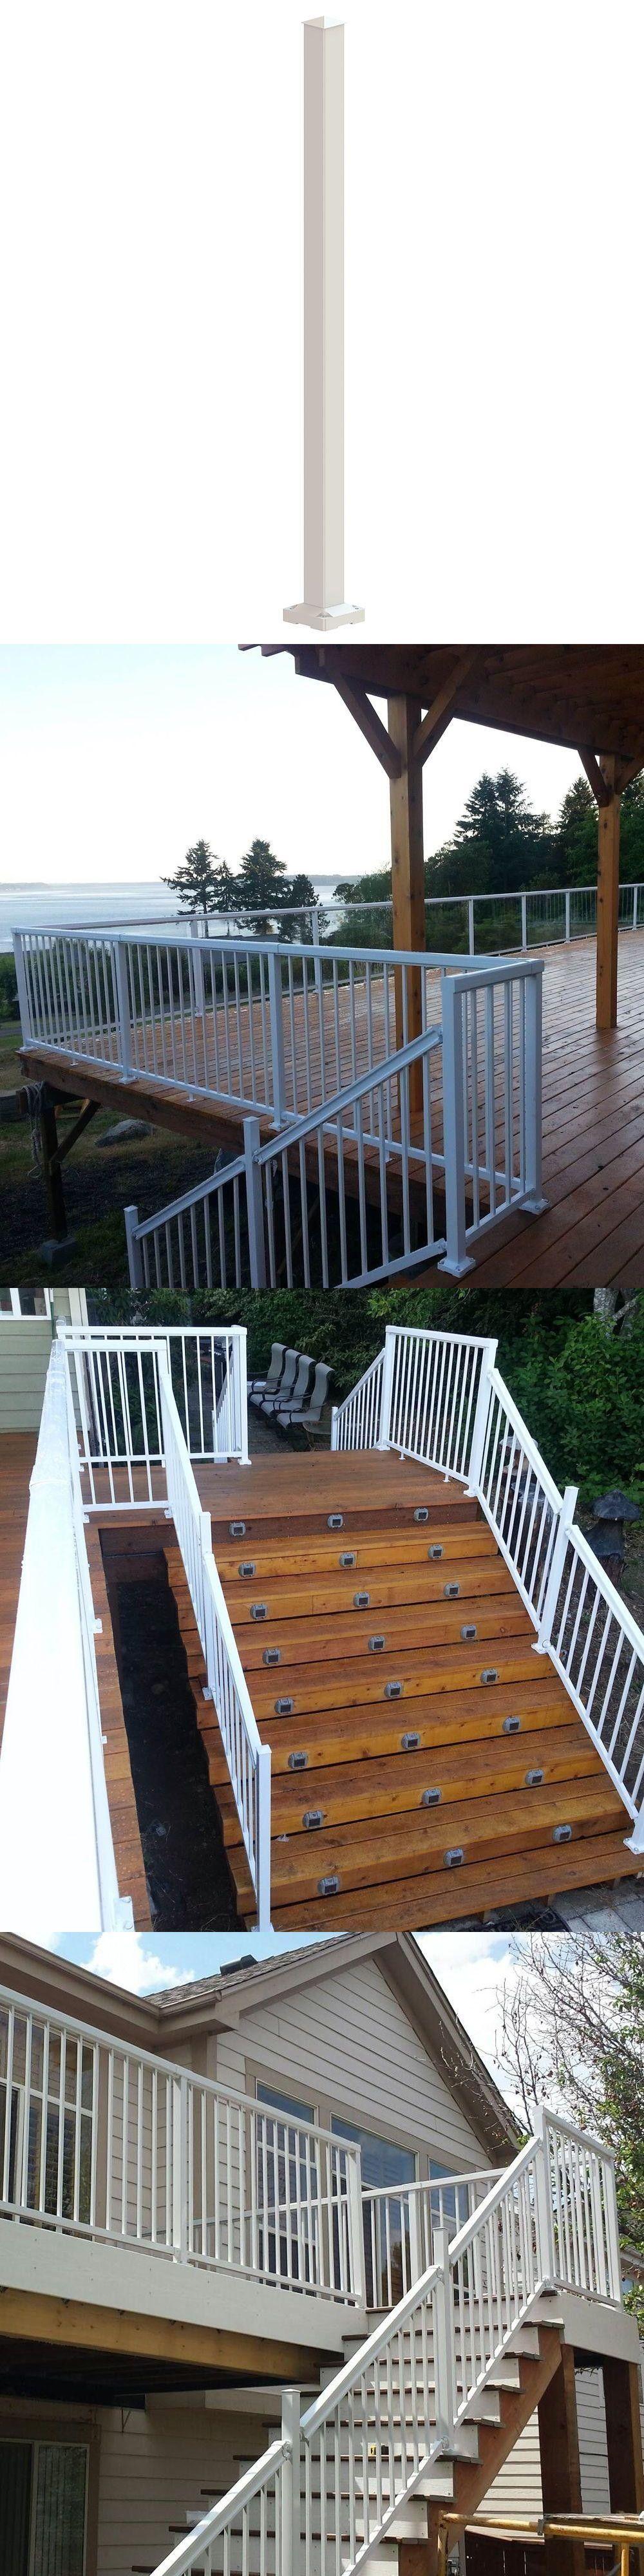 Best Railings 139950 Peak Aluminum Railing Stair Post White 640 x 480